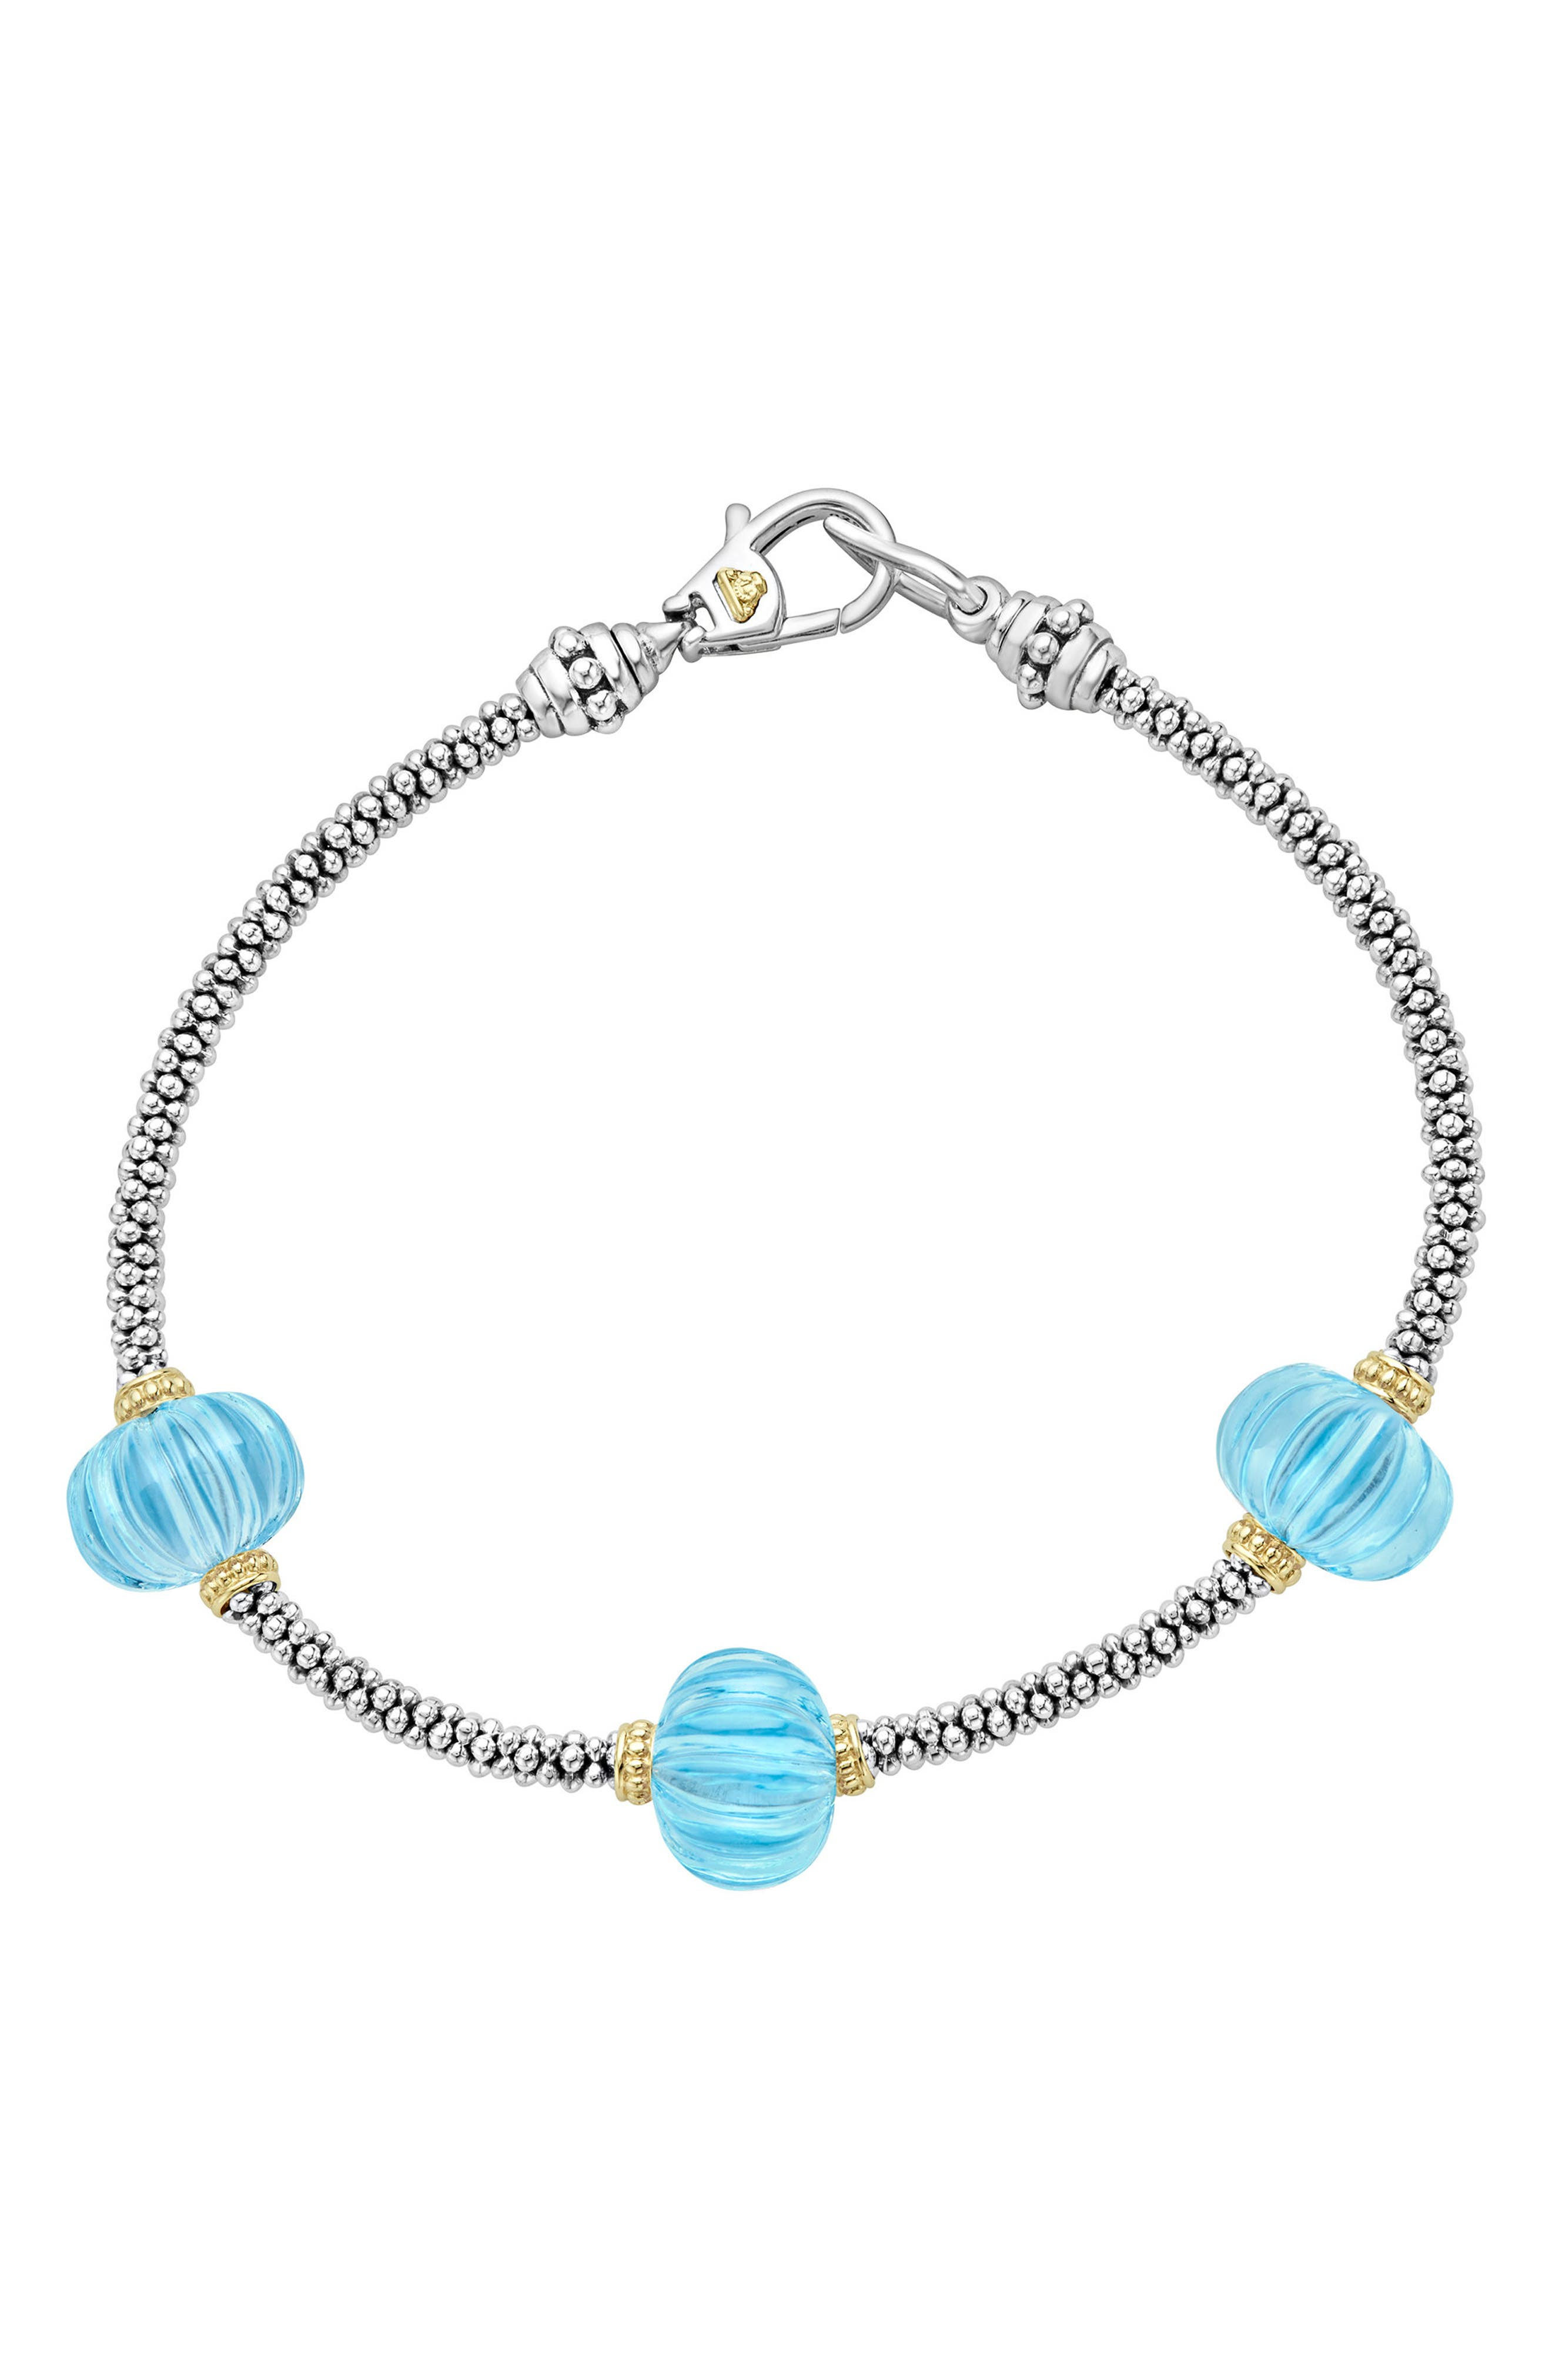 Caviar Forever Melon Bead Station Bracelet,                             Main thumbnail 1, color,                             Silver/ Sky Blue Topaz